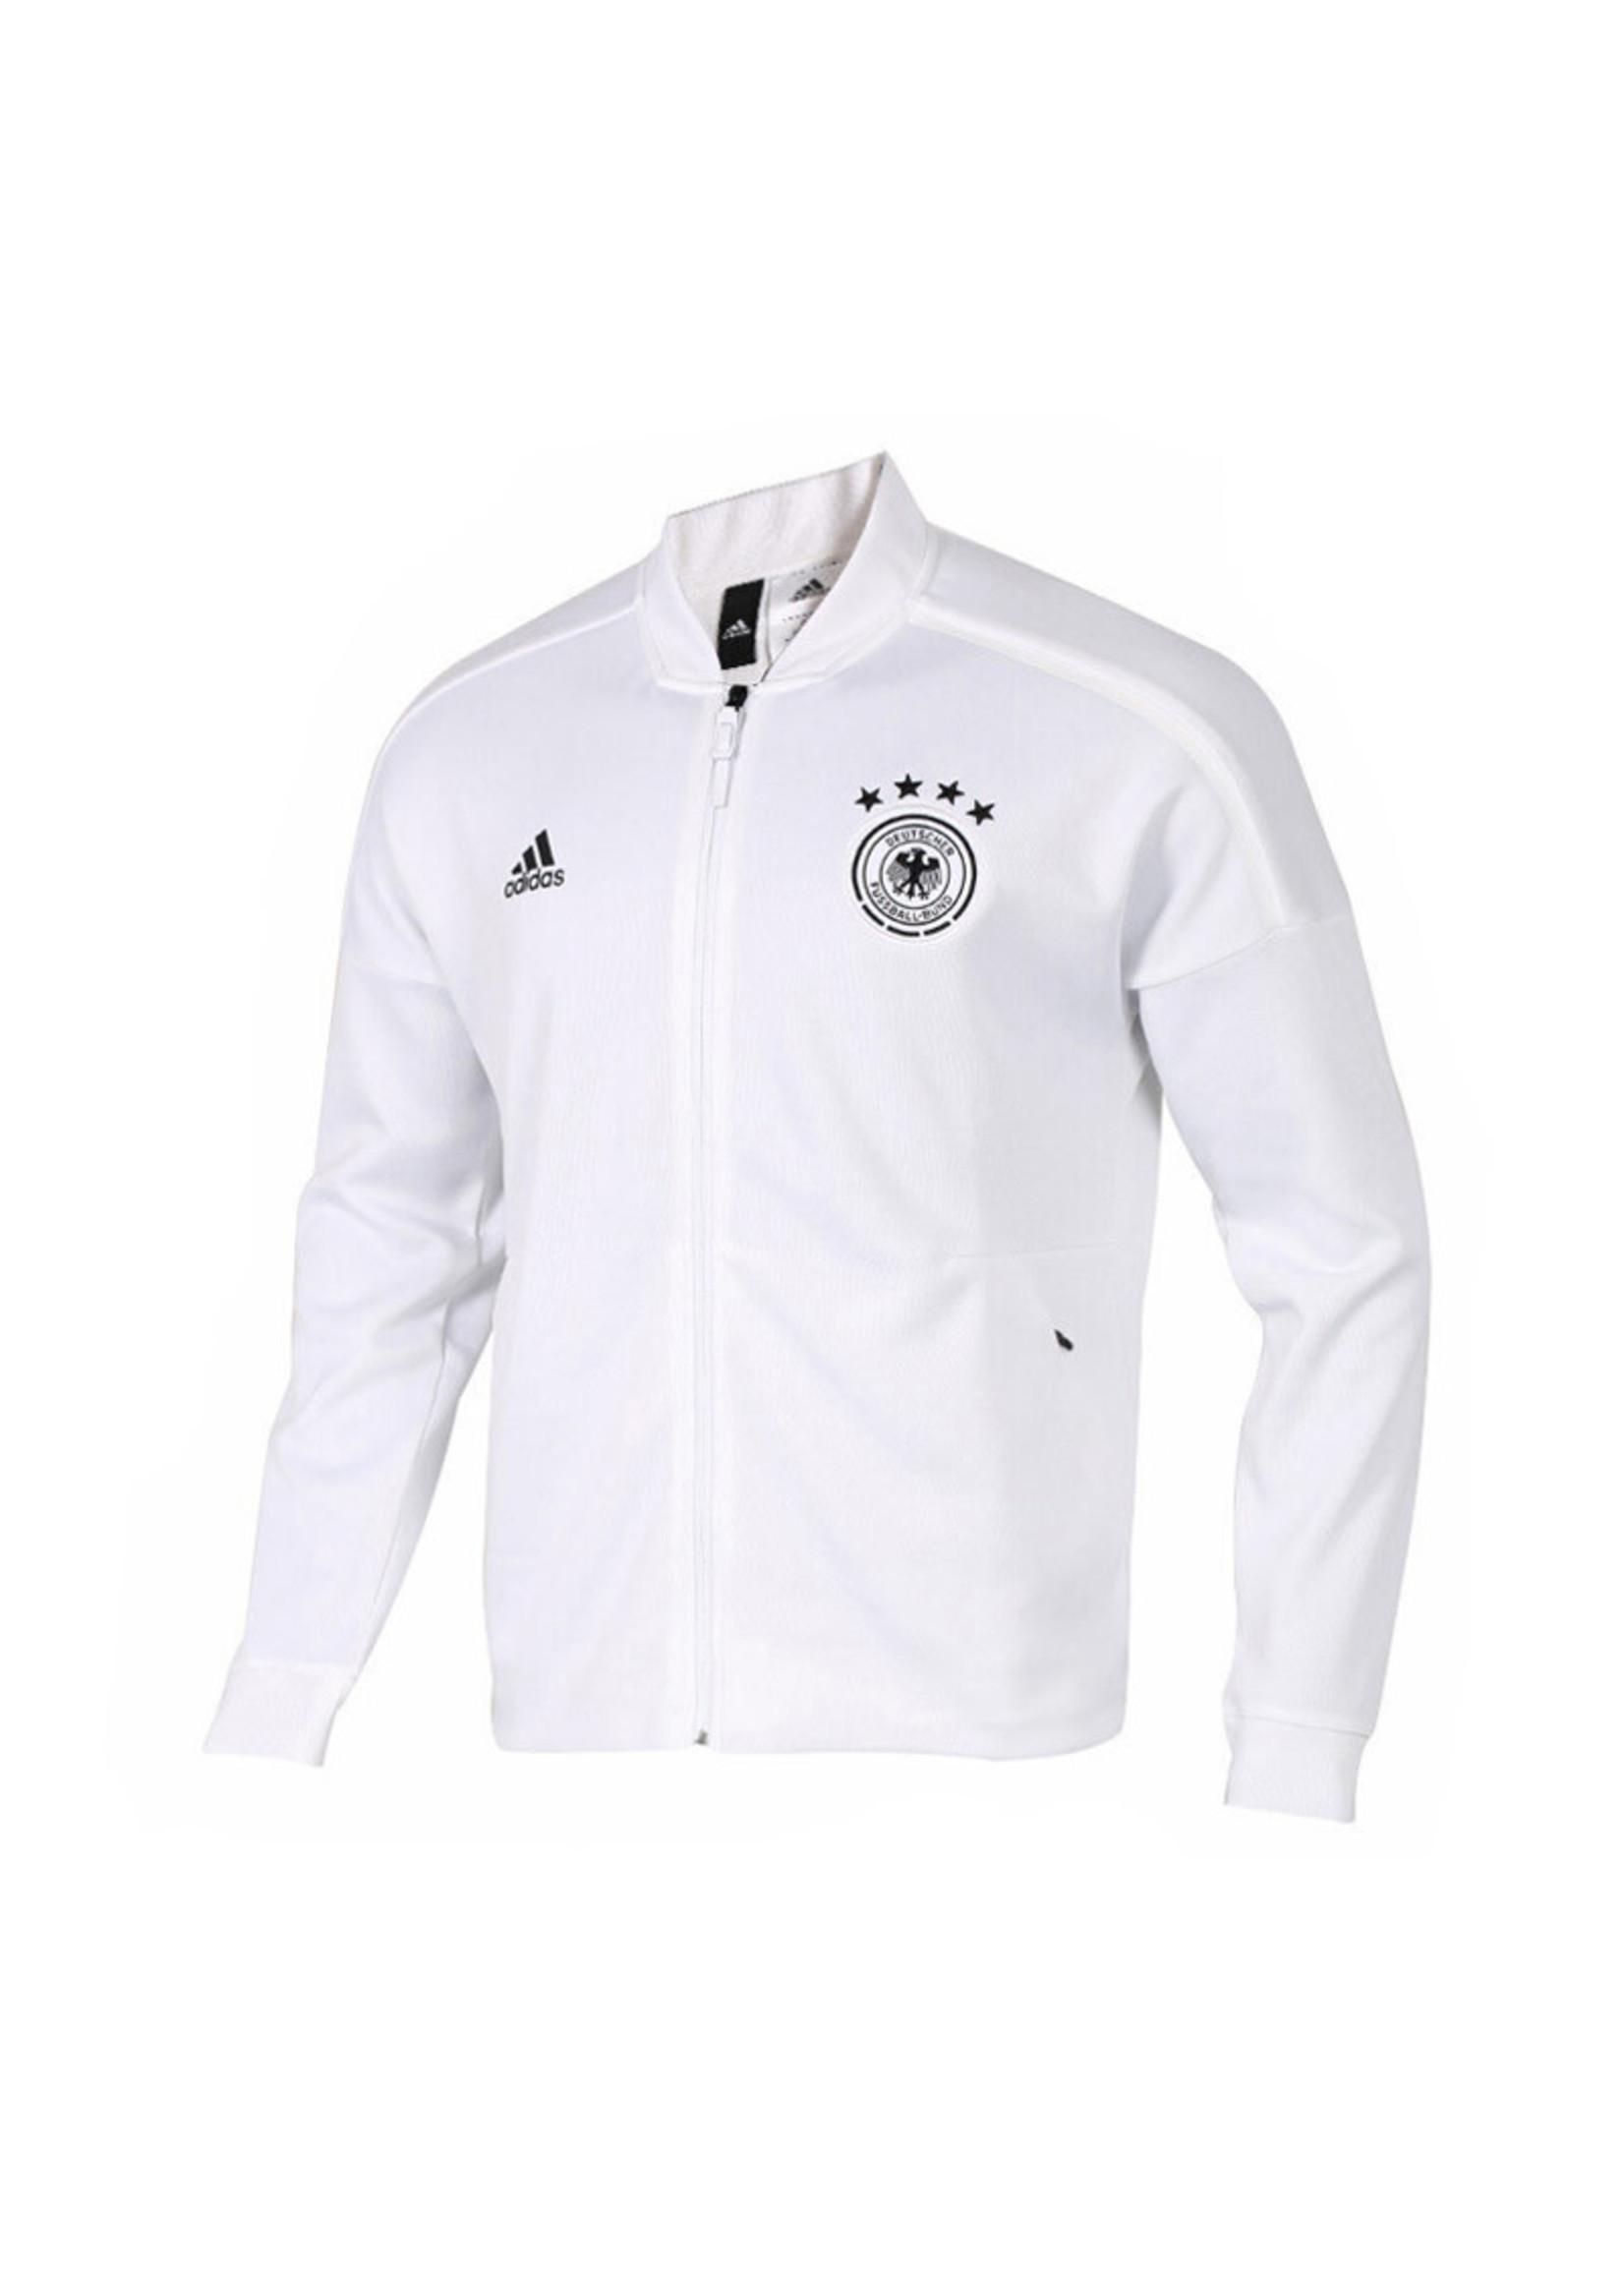 Adidas Germany Track Jacket - Full Zip - CF2452